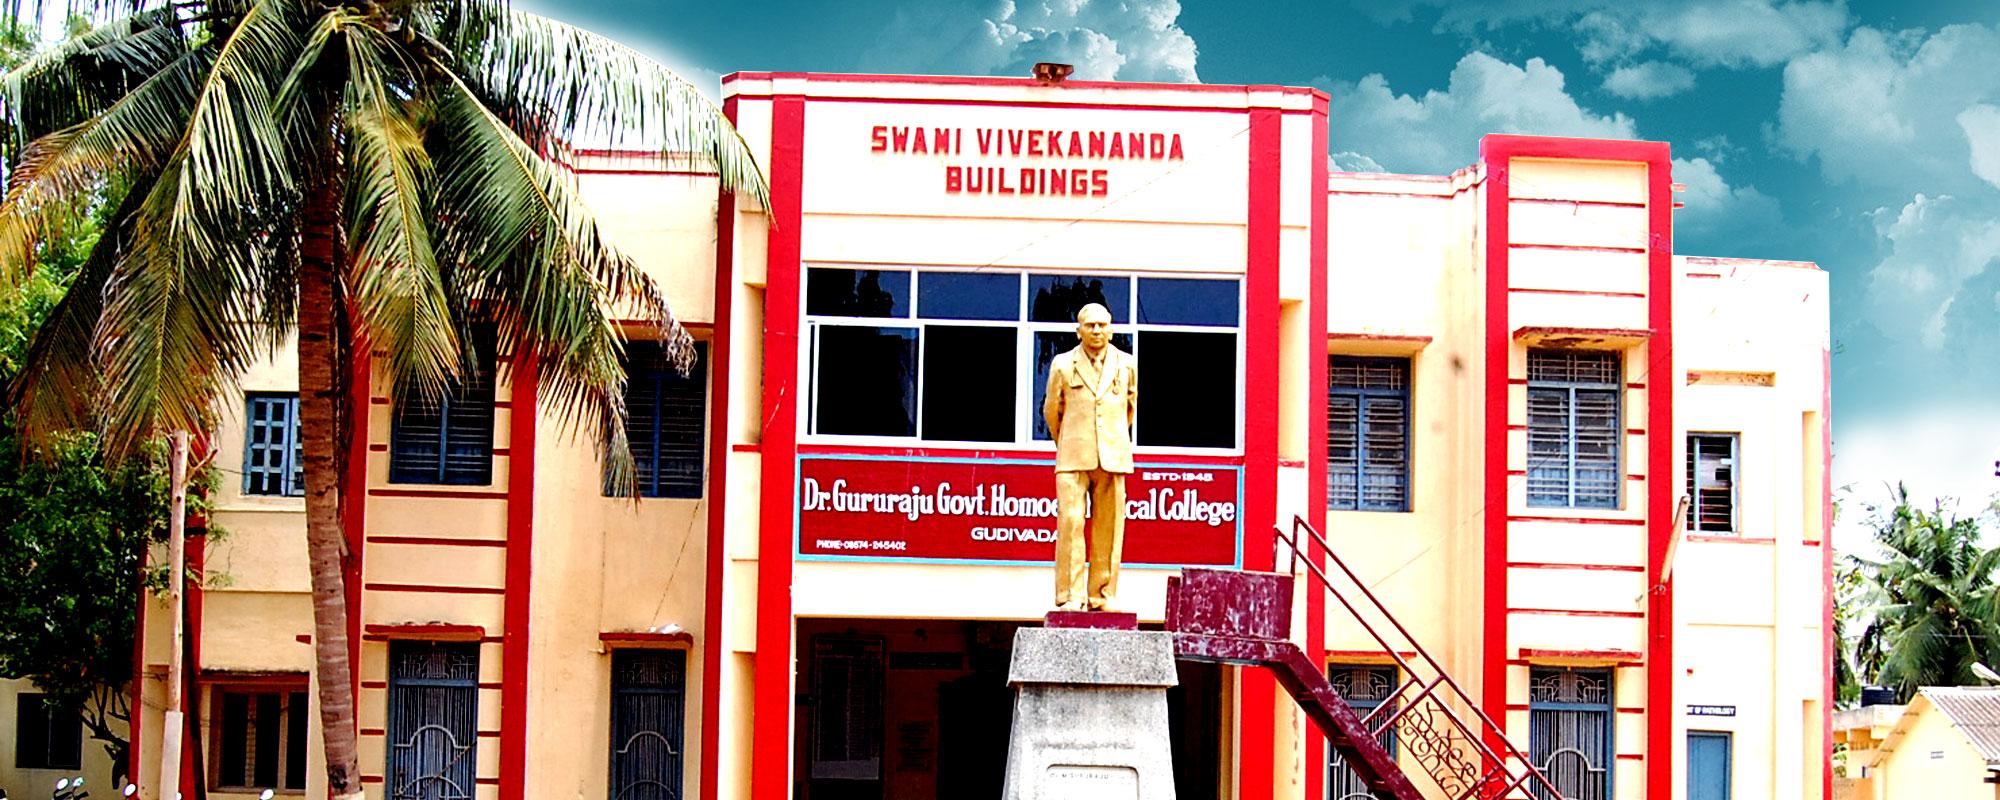 Dr. Gururaju Government Homoeopathic Medical College, Gudivada